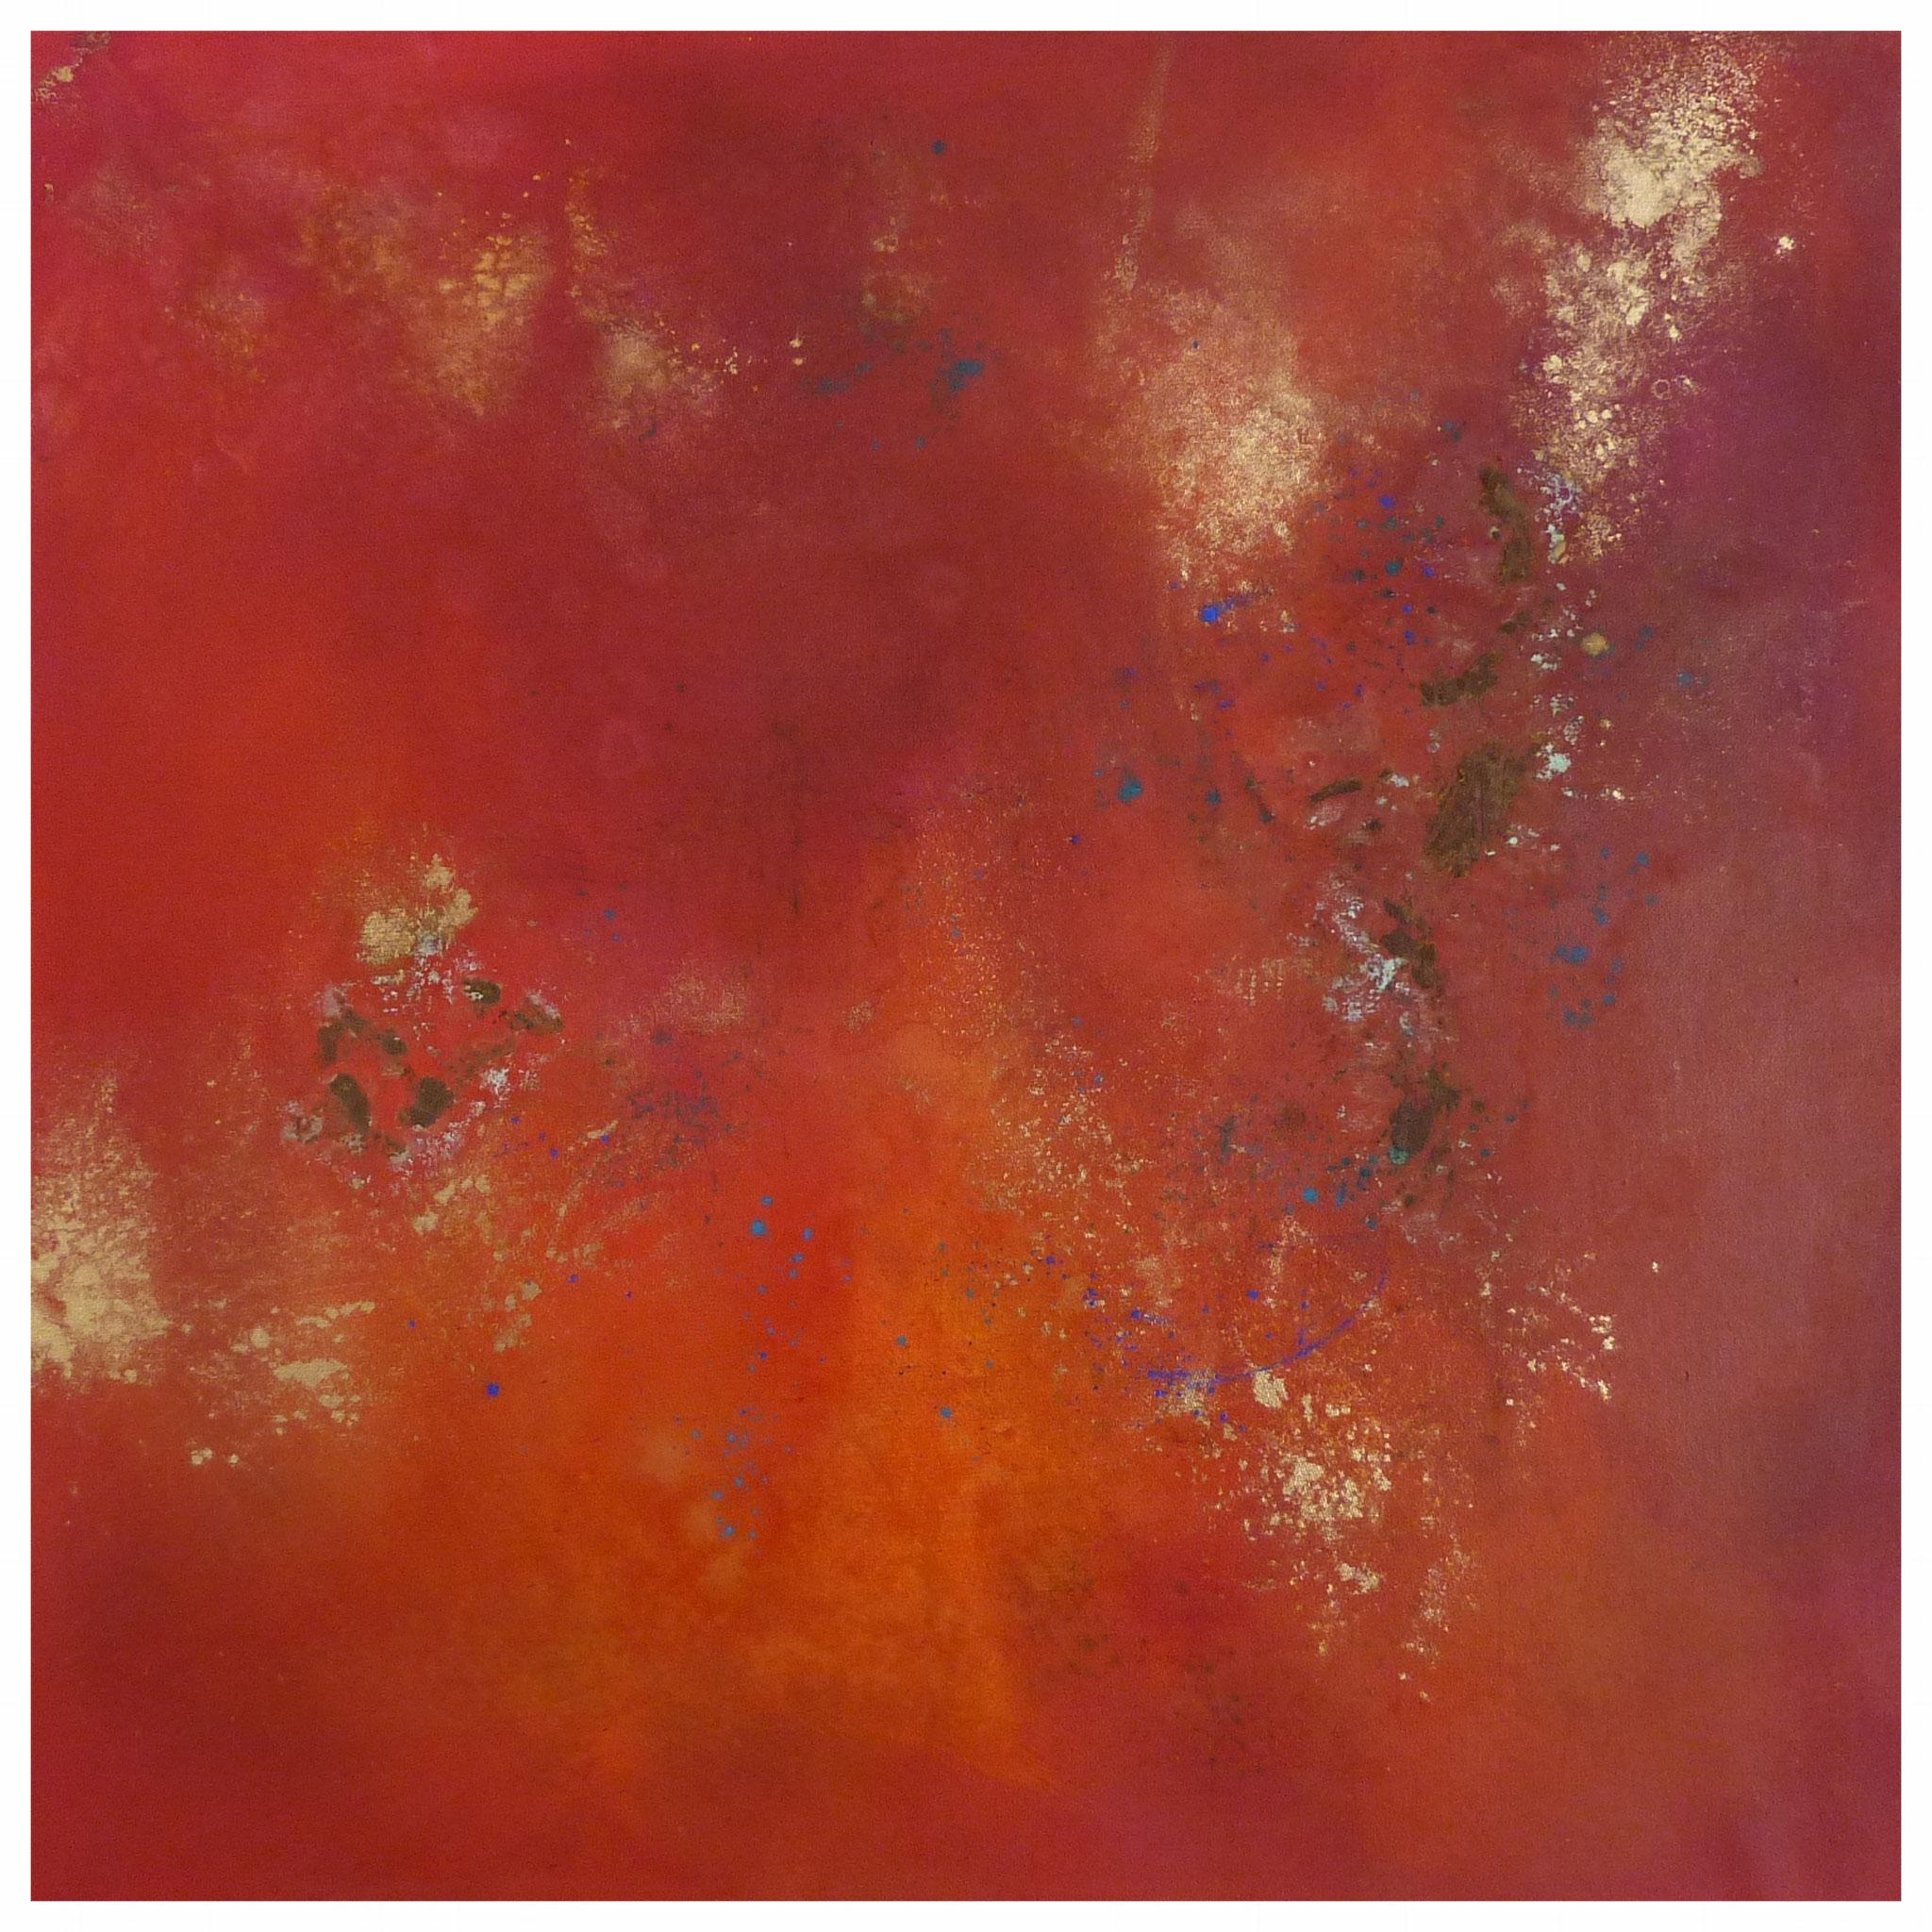 Orange II, 60 x 60 / 2016